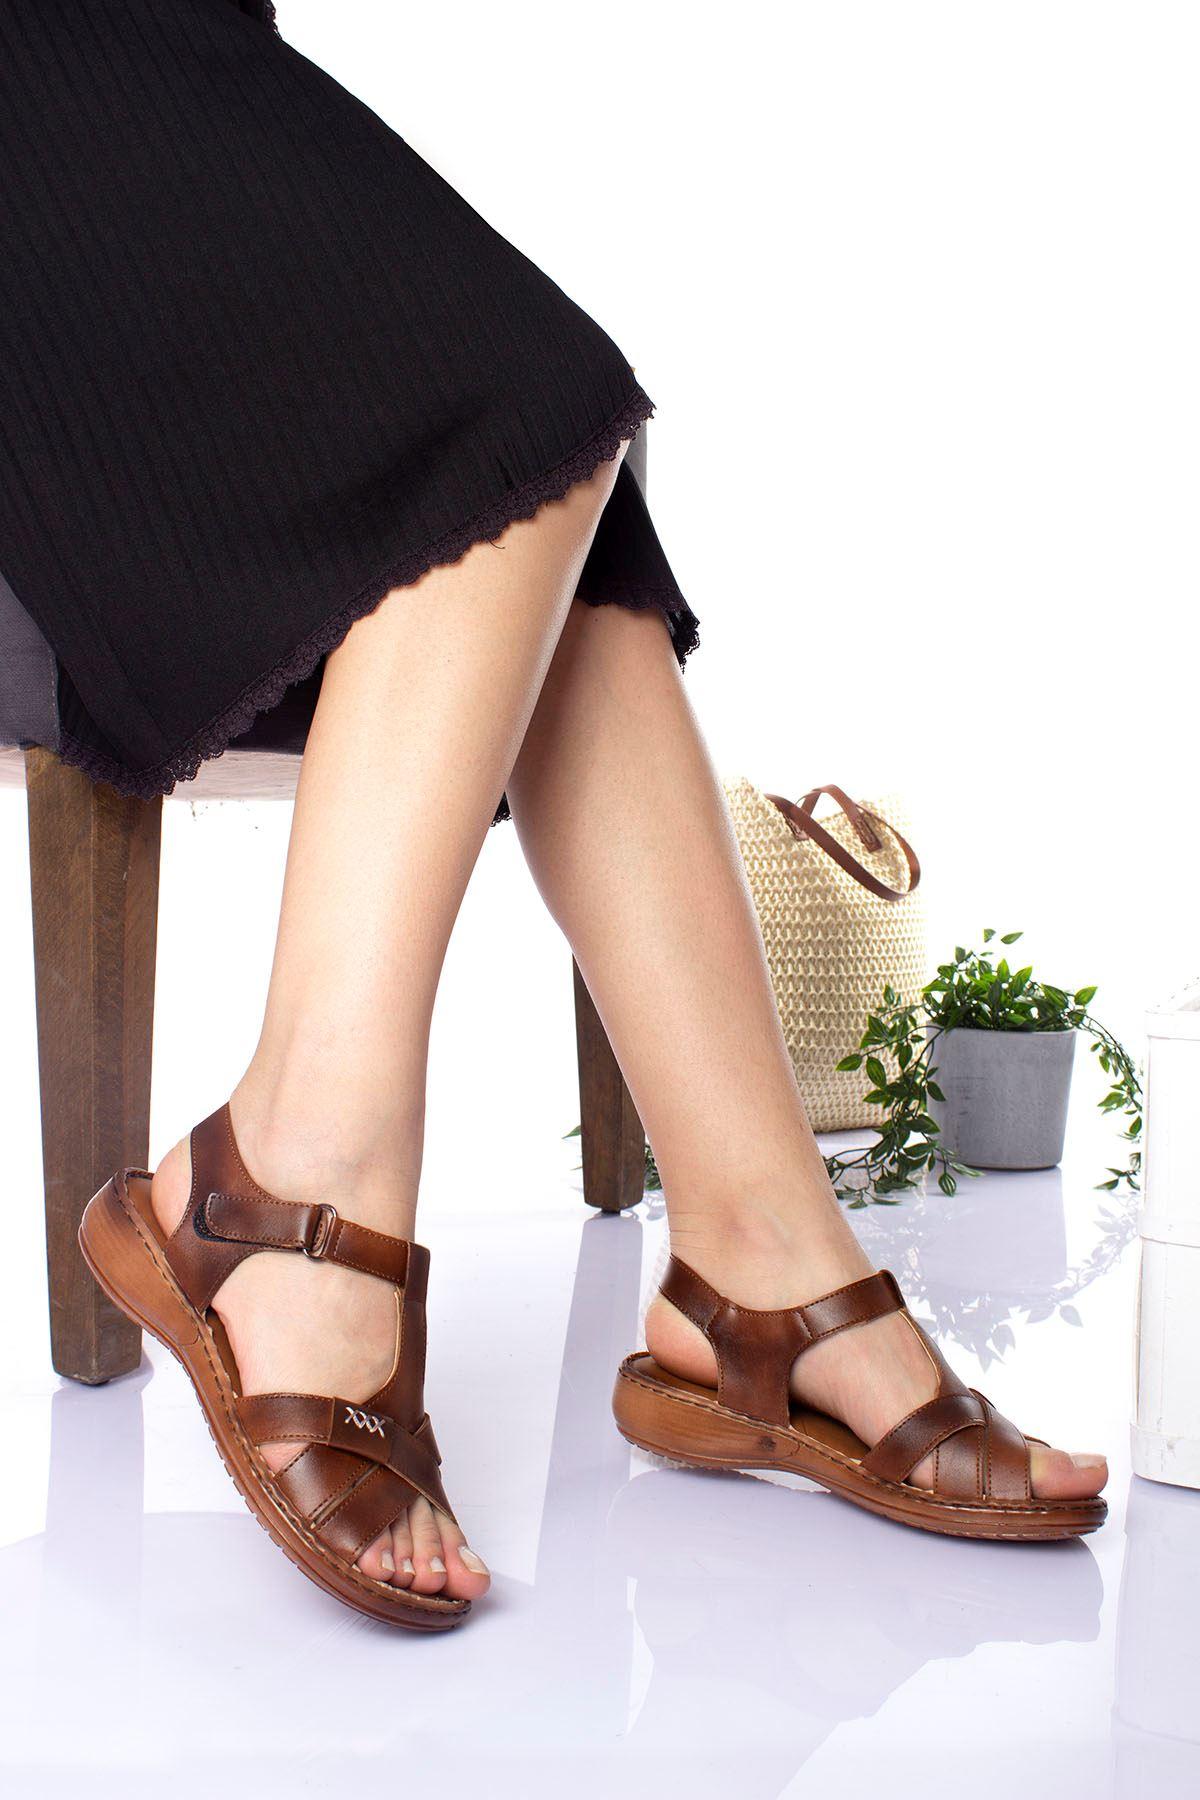 Ortopedik Ped İçi Deri Alçak Taban Kahverengi Sandalet